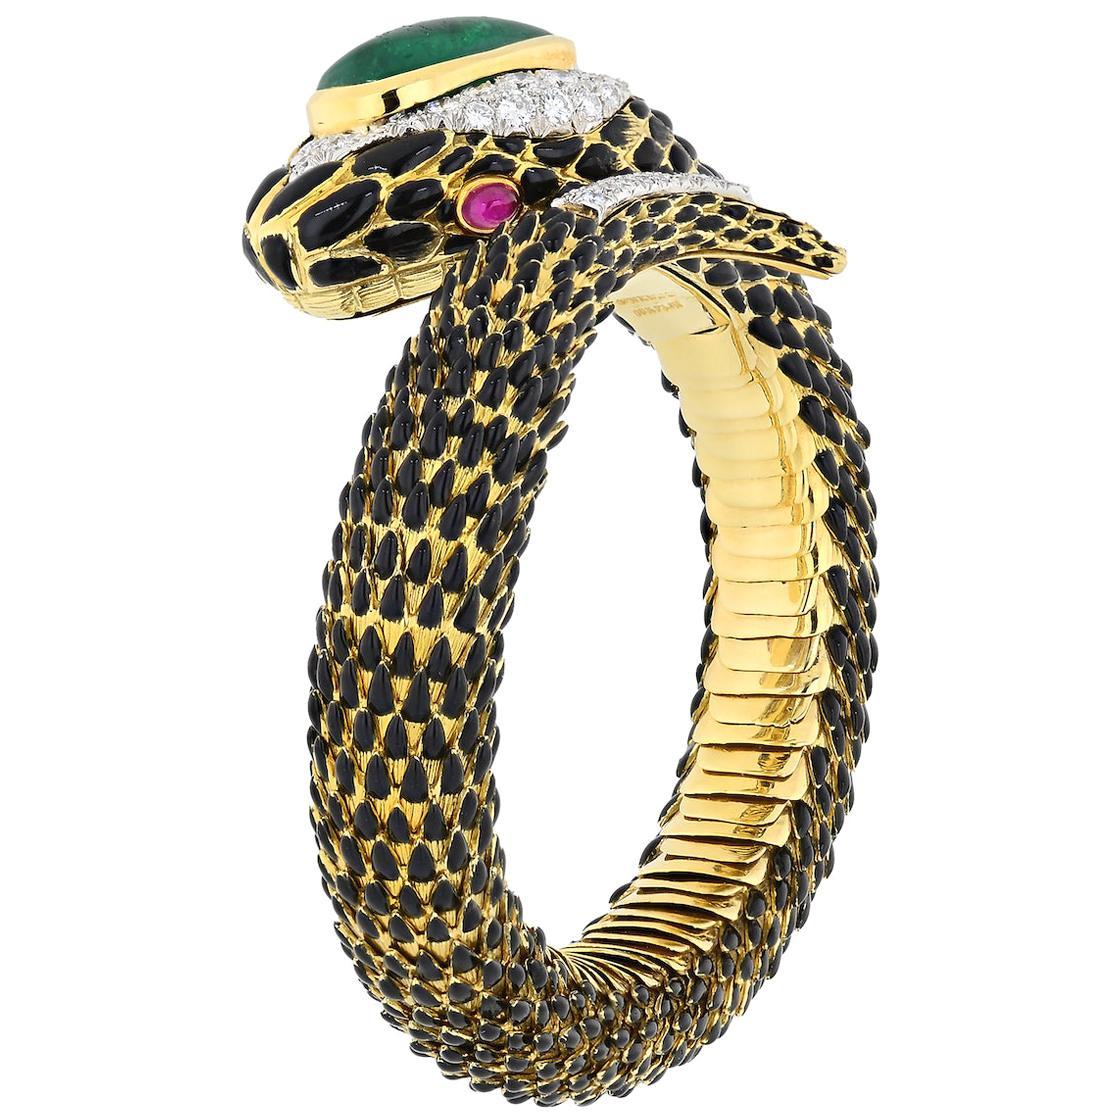 David Webb Gold, Emerald, Ruby and Diamond Snake Charmer Bracelet